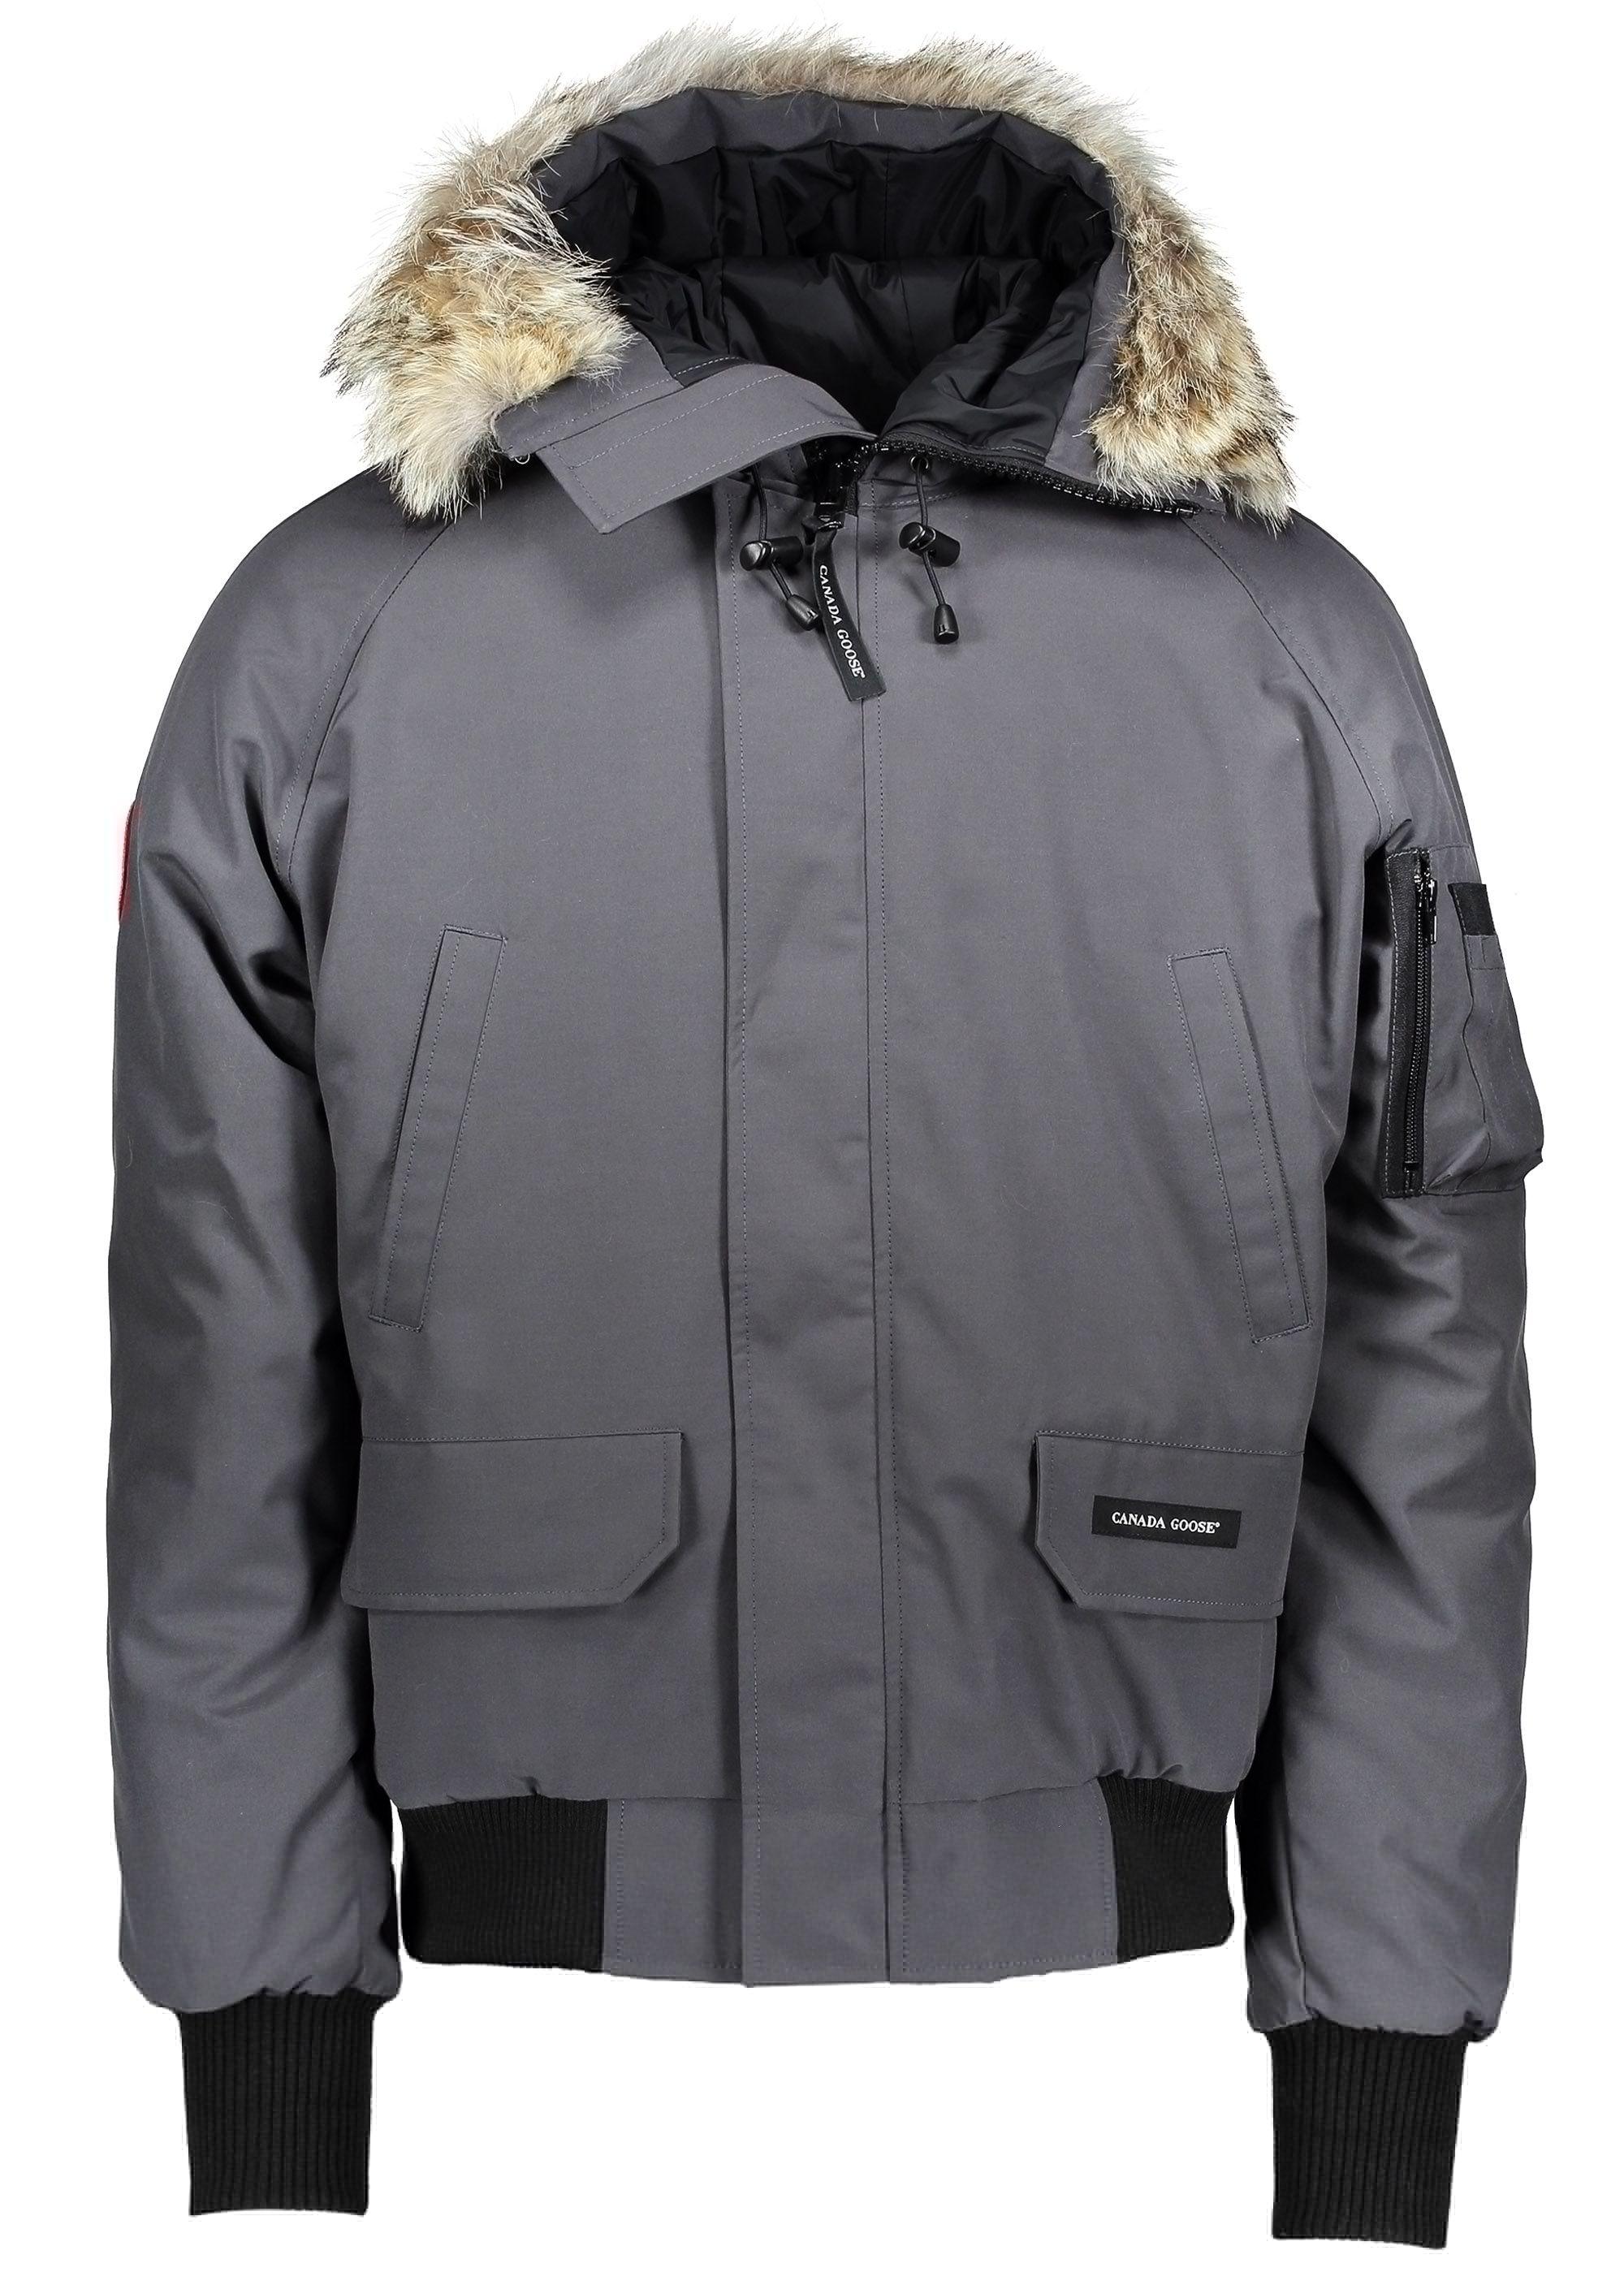 Canada Goose Chilliwack Bomber Bomber jacket men, Mens